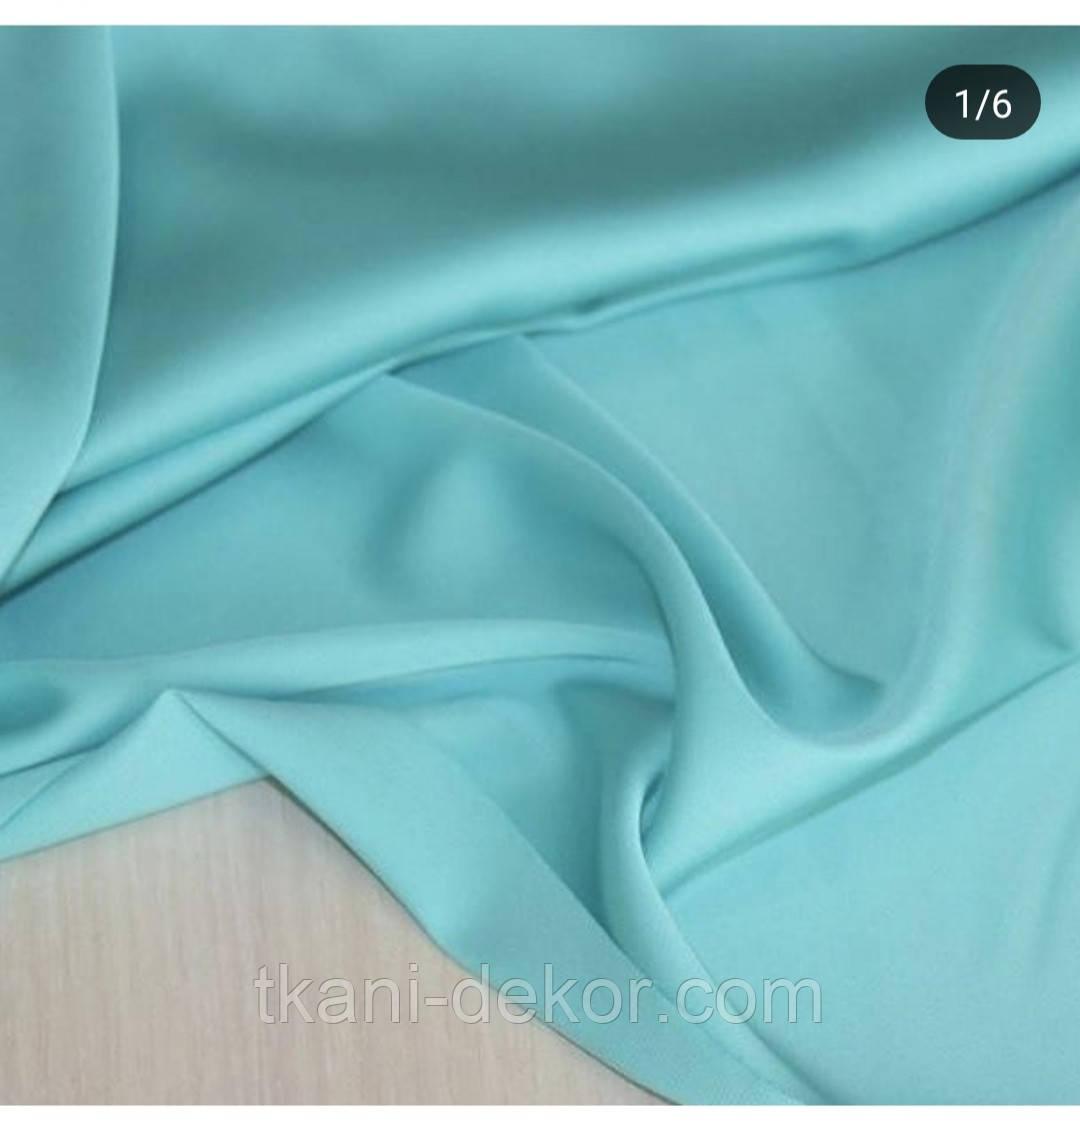 Сатин (бавовняна тканина) аква однотон